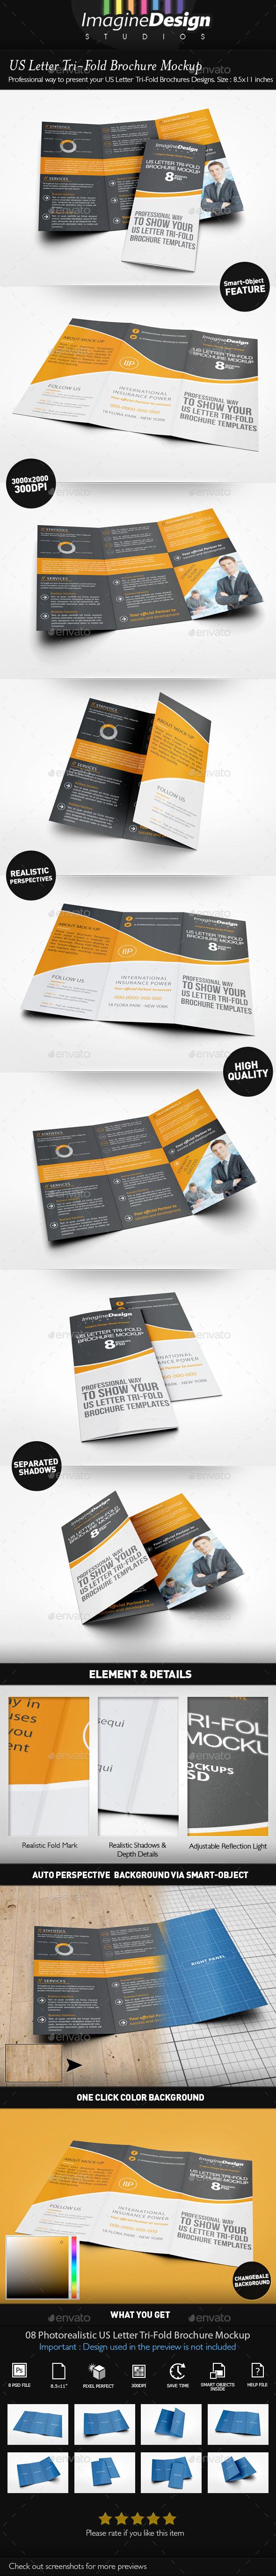 GraphicRiver US Letter Tri-Fold Brochure Mockup 11883833